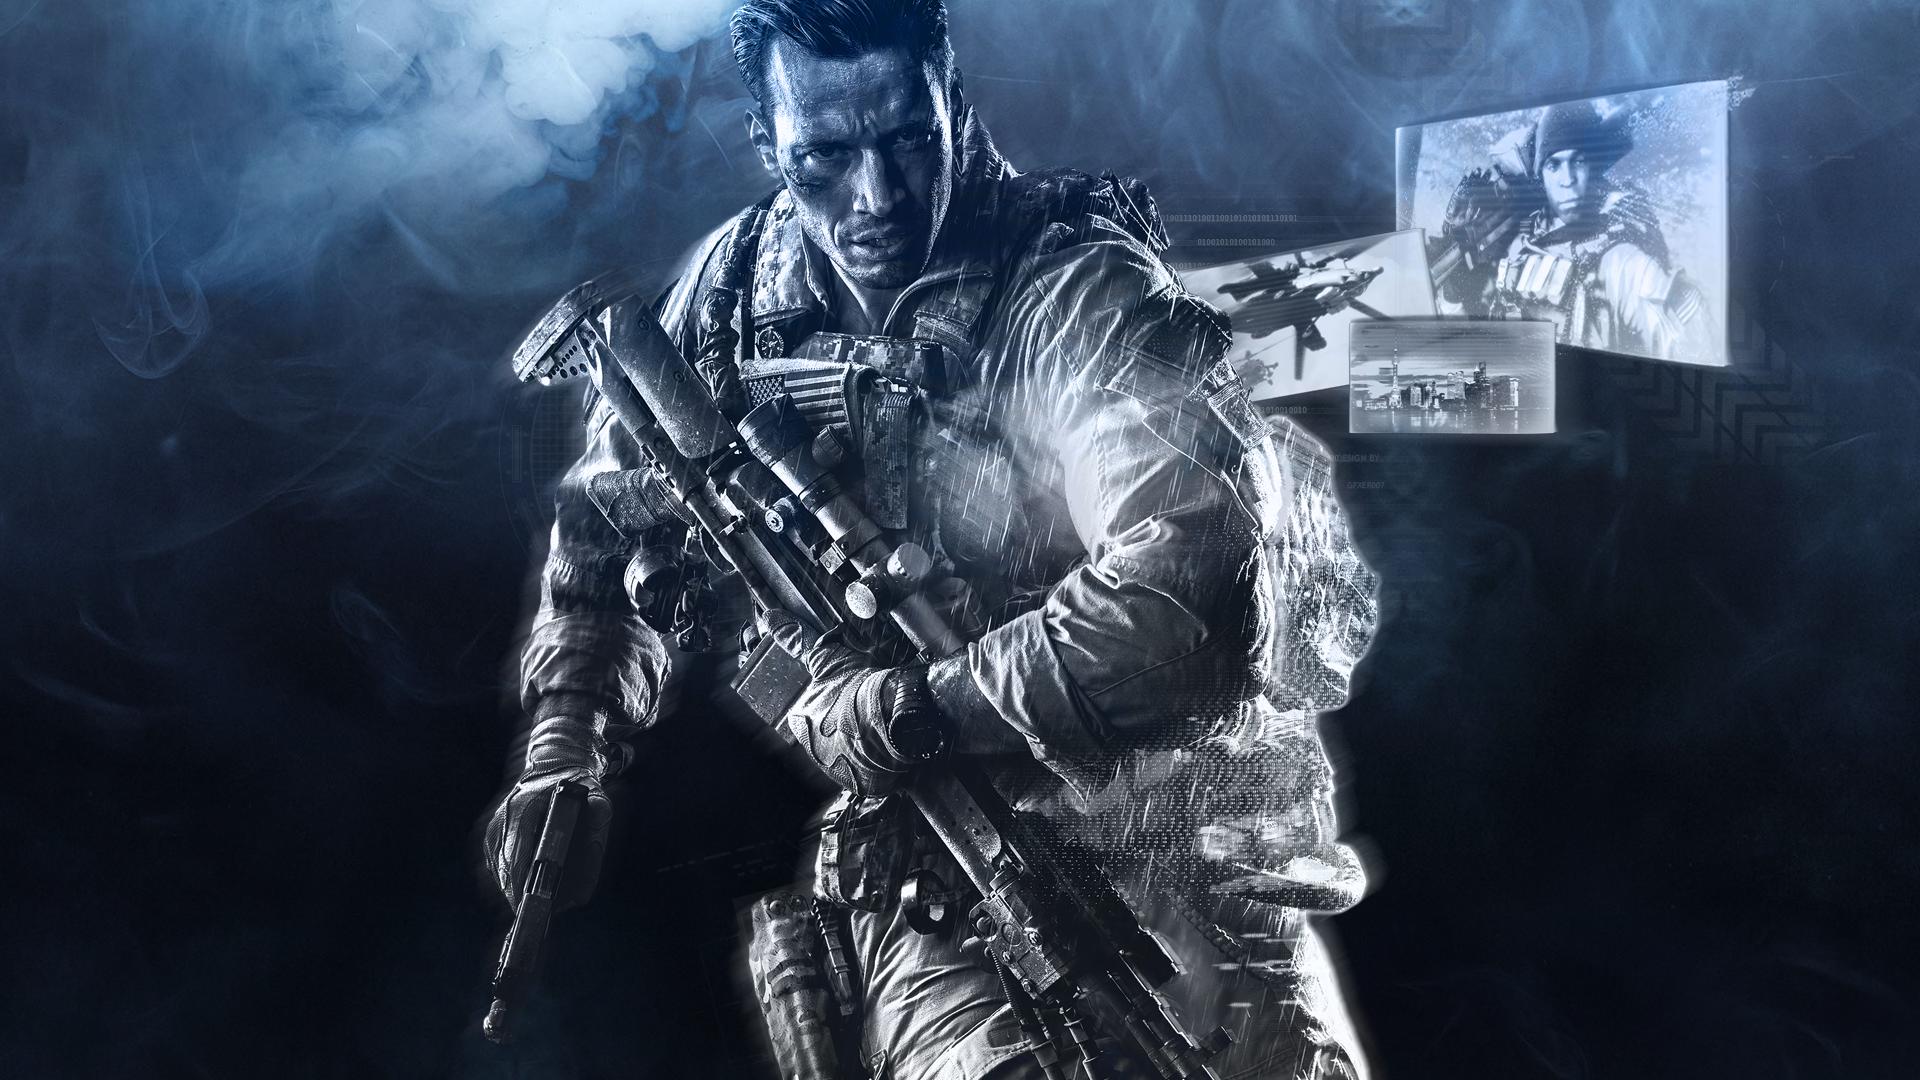 Progression: Battlefield 4 Wallpaper | GFXer007